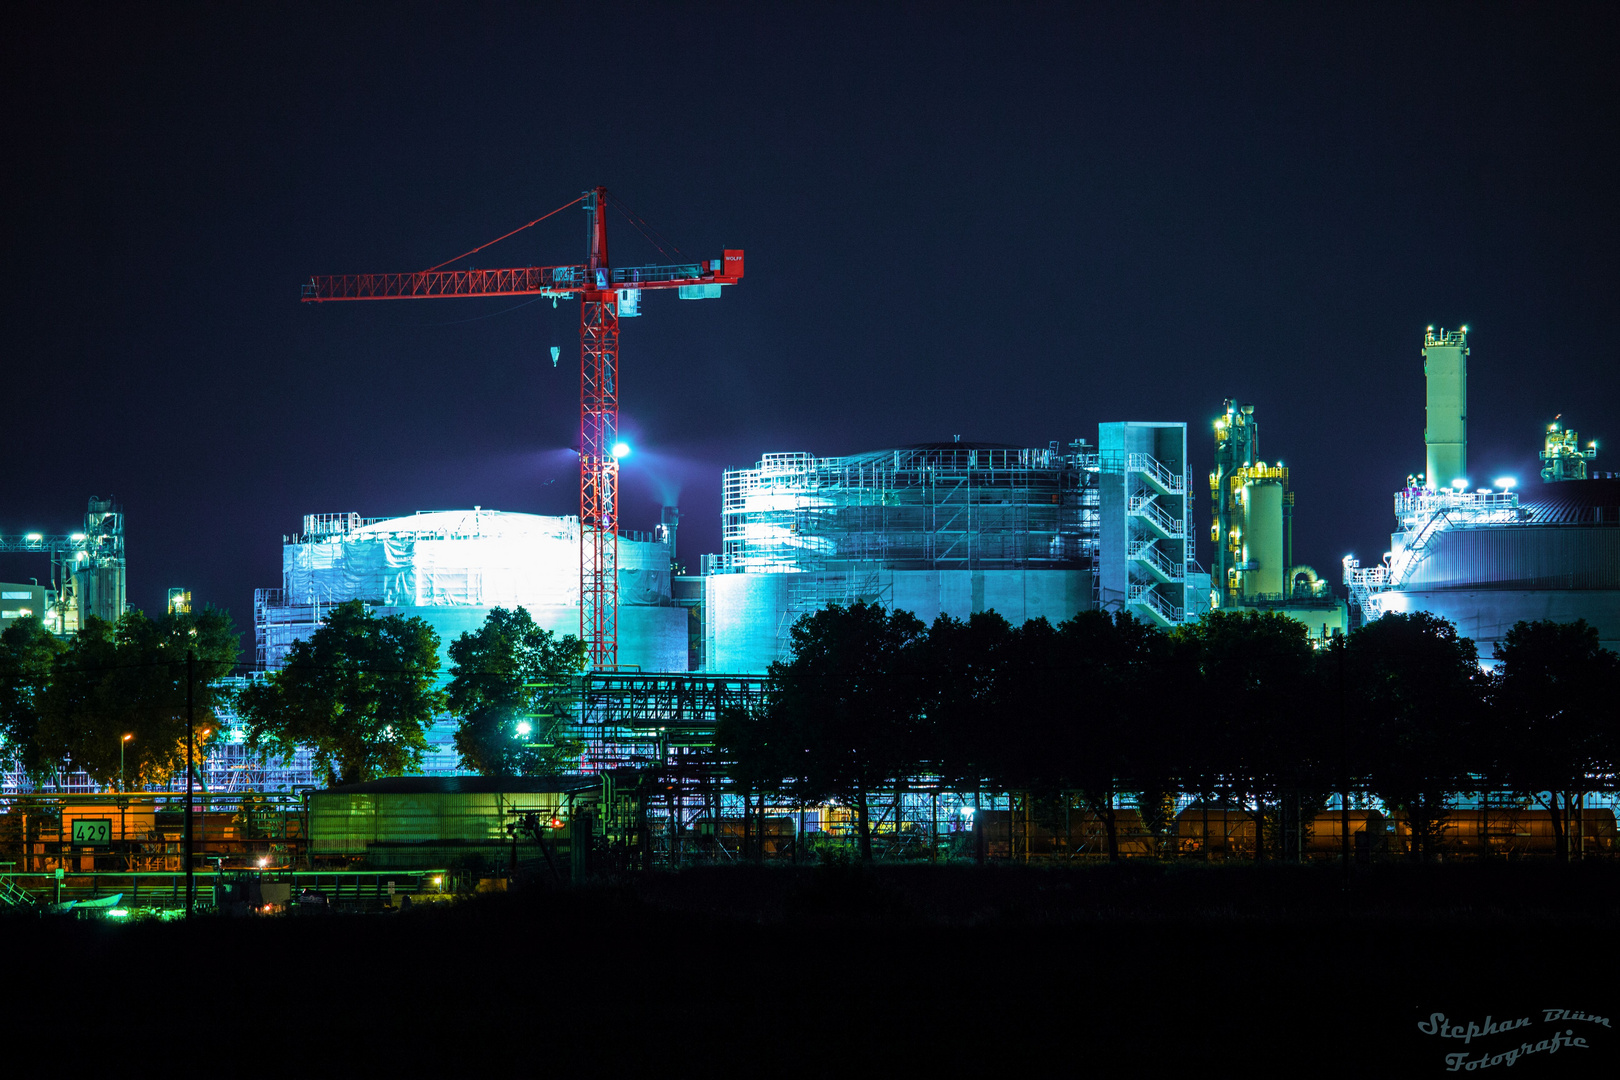 BASF Ludwigshafen bei Nacht